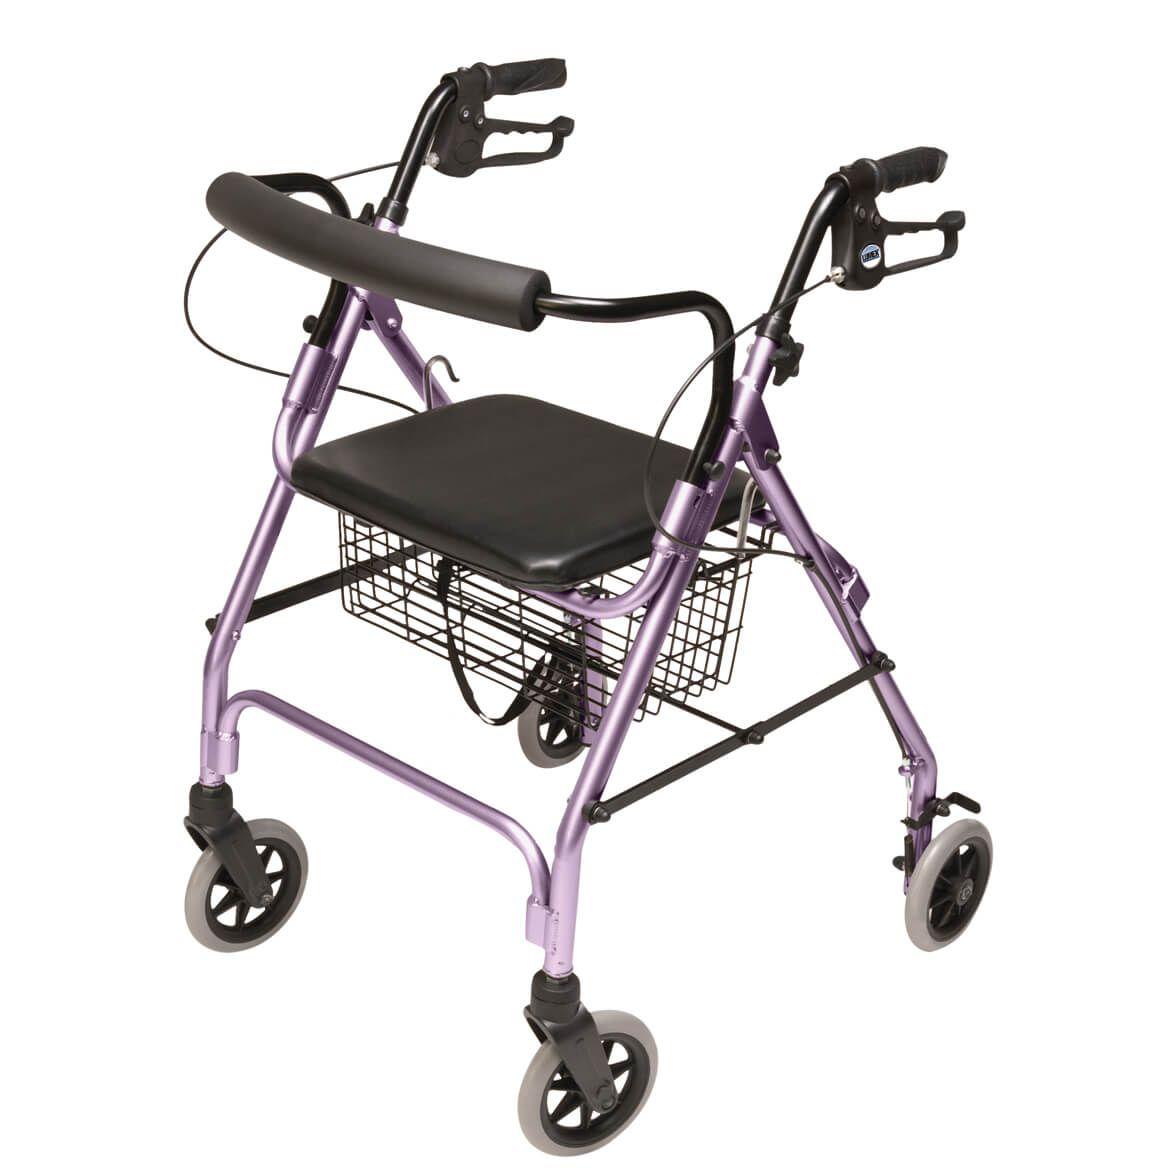 Lumex Walkabout Lite 4 Wheel Rollator-335320